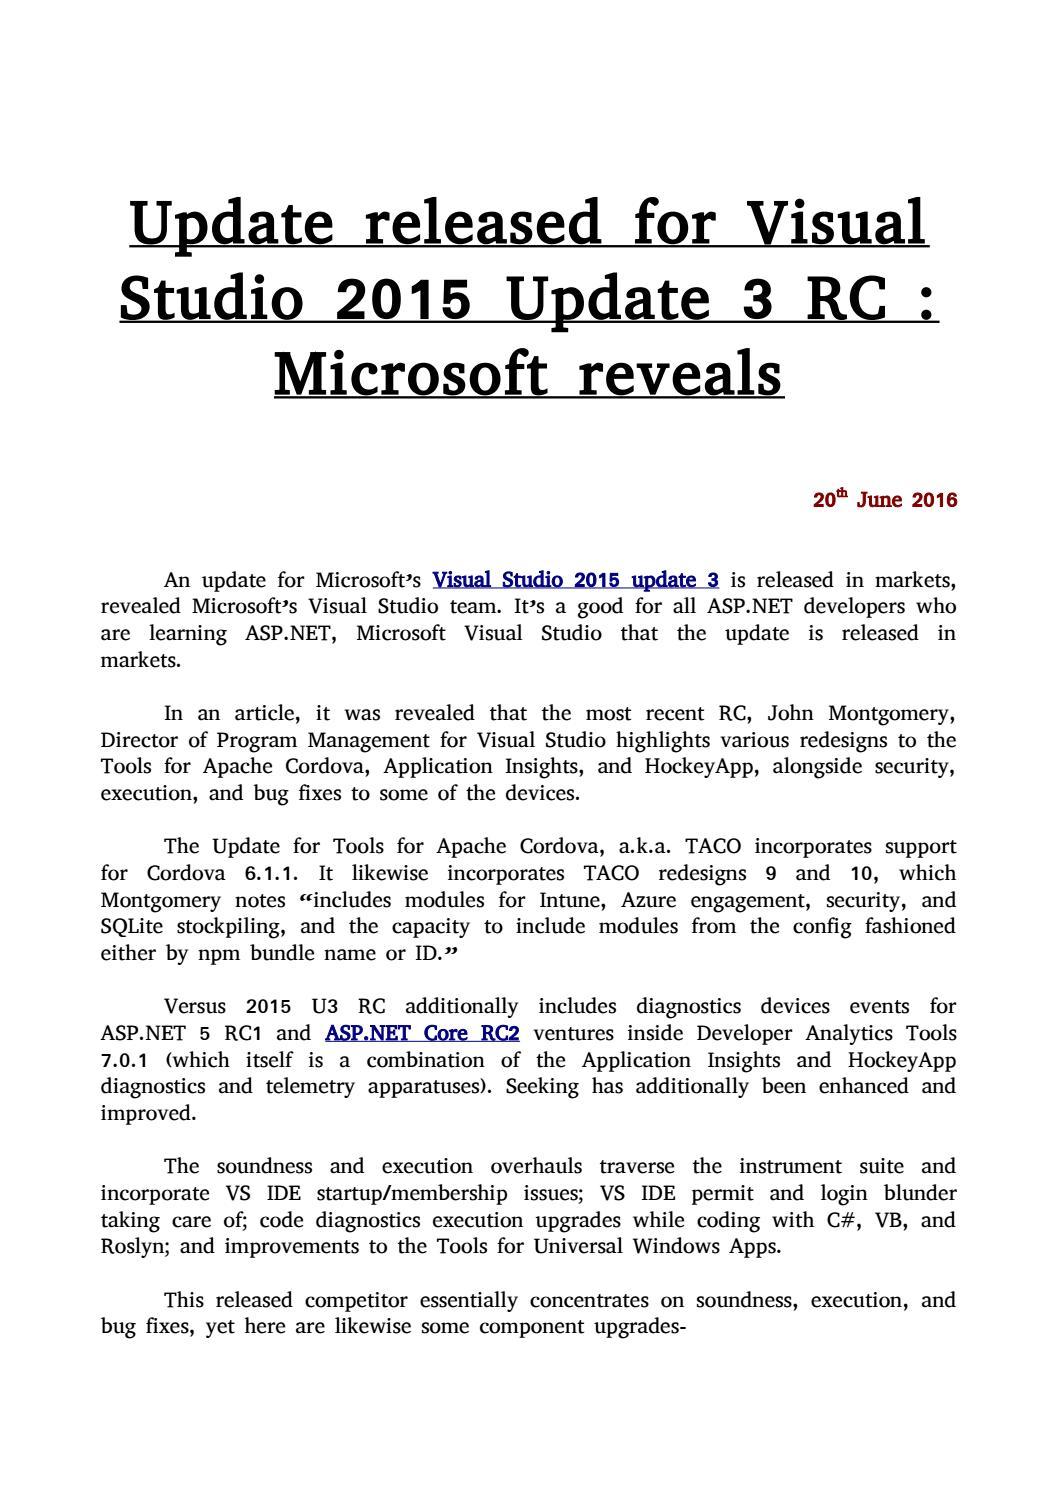 Update released for Visual Studio 2015 Update 3 RC